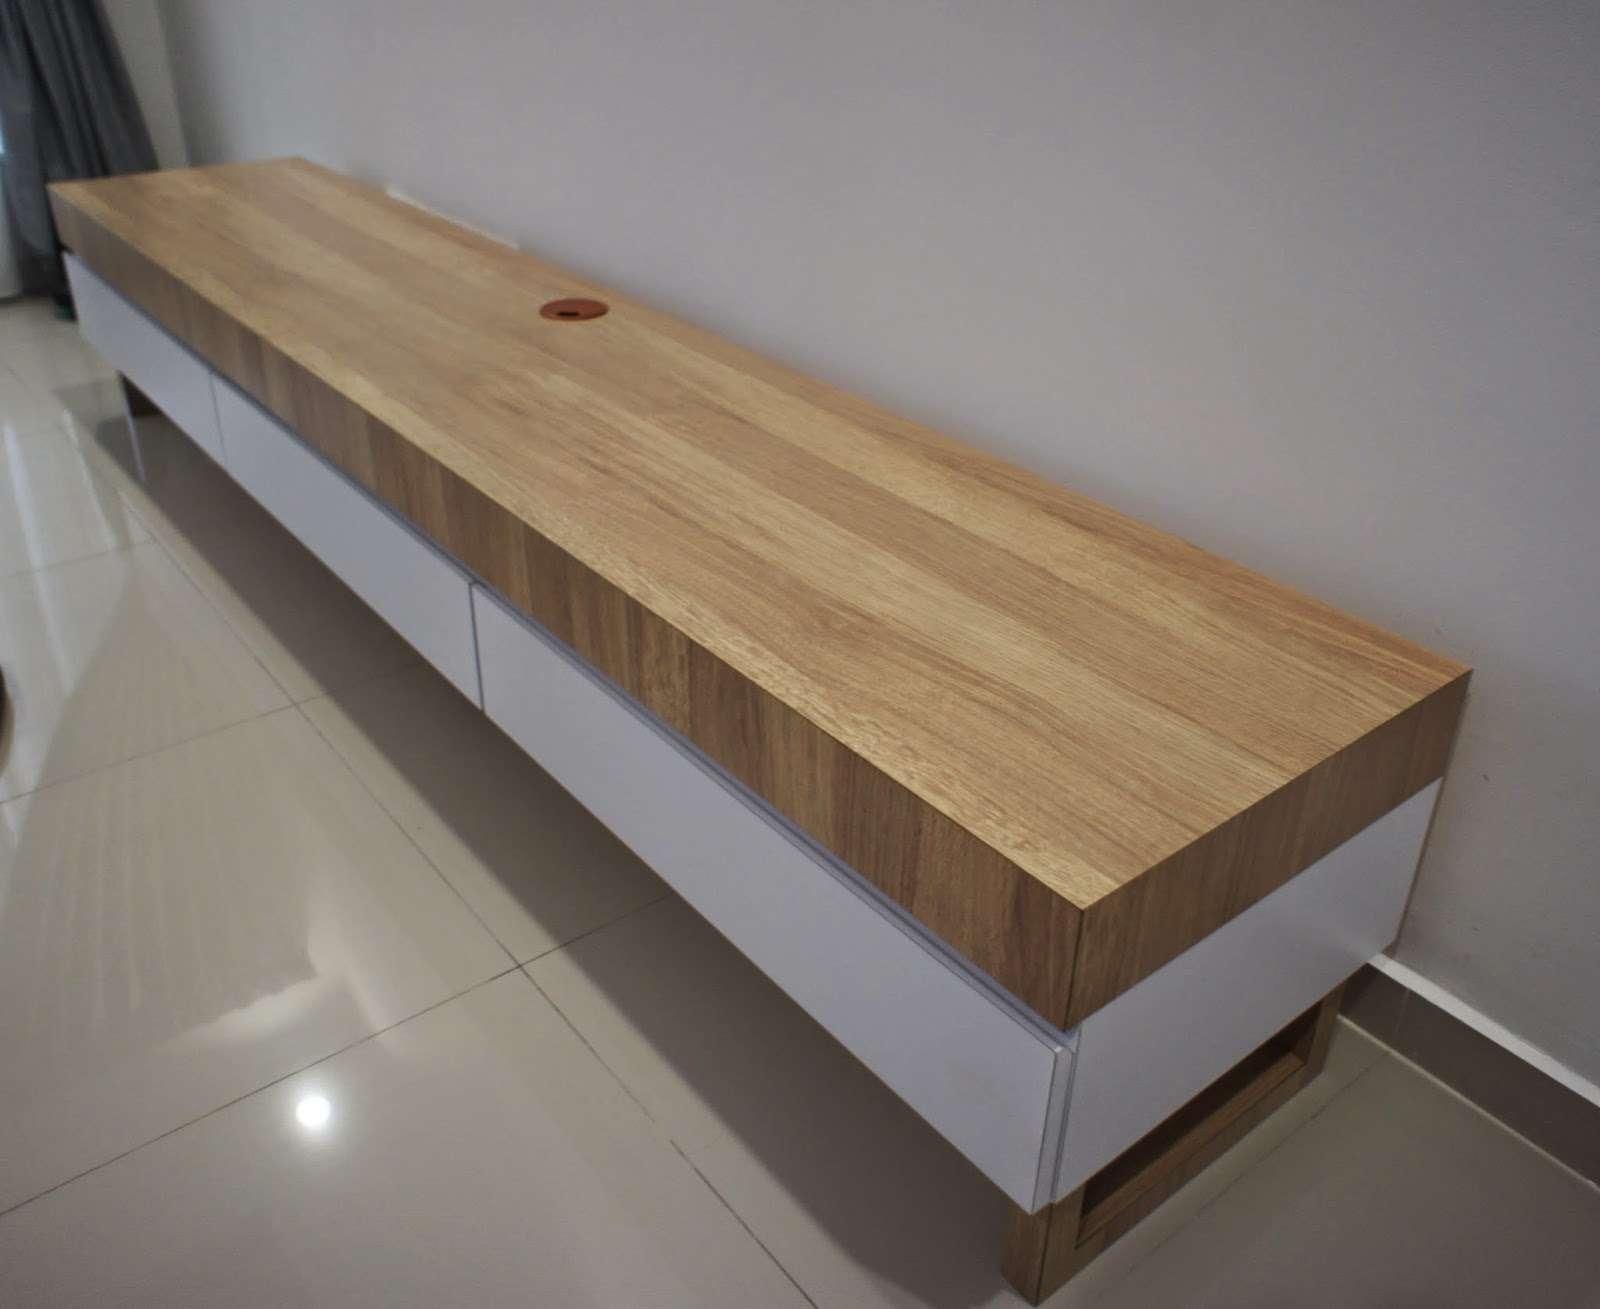 Fukusu: Scandinavian Design Tv Cabinet And Study Table In Awesome With Scandinavian Design Tv Cabinets (View 1 of 20)